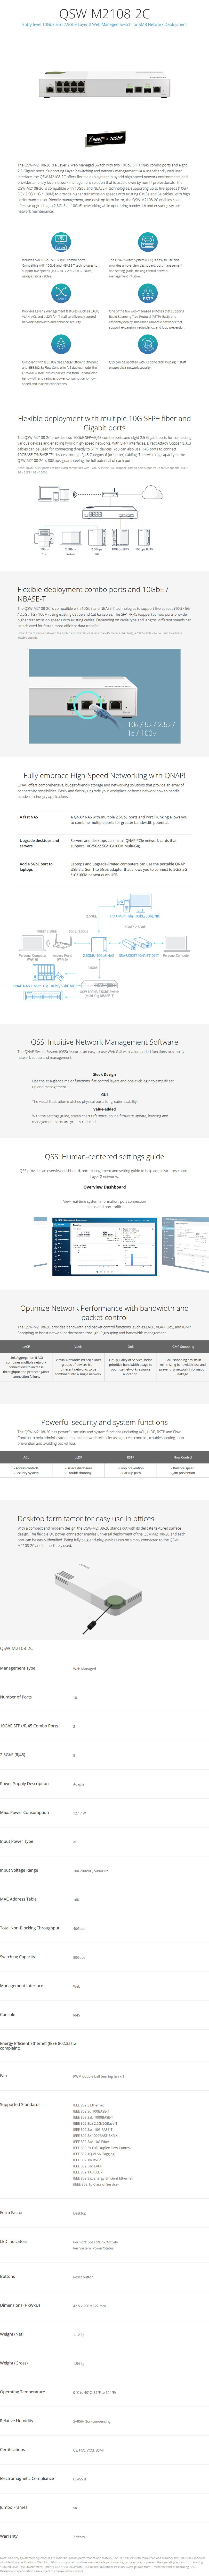 qnap-qswm21082c-8port-25gbe-2port-10gbe-combo-managed-desktop-switch-ac40486-2.jpg